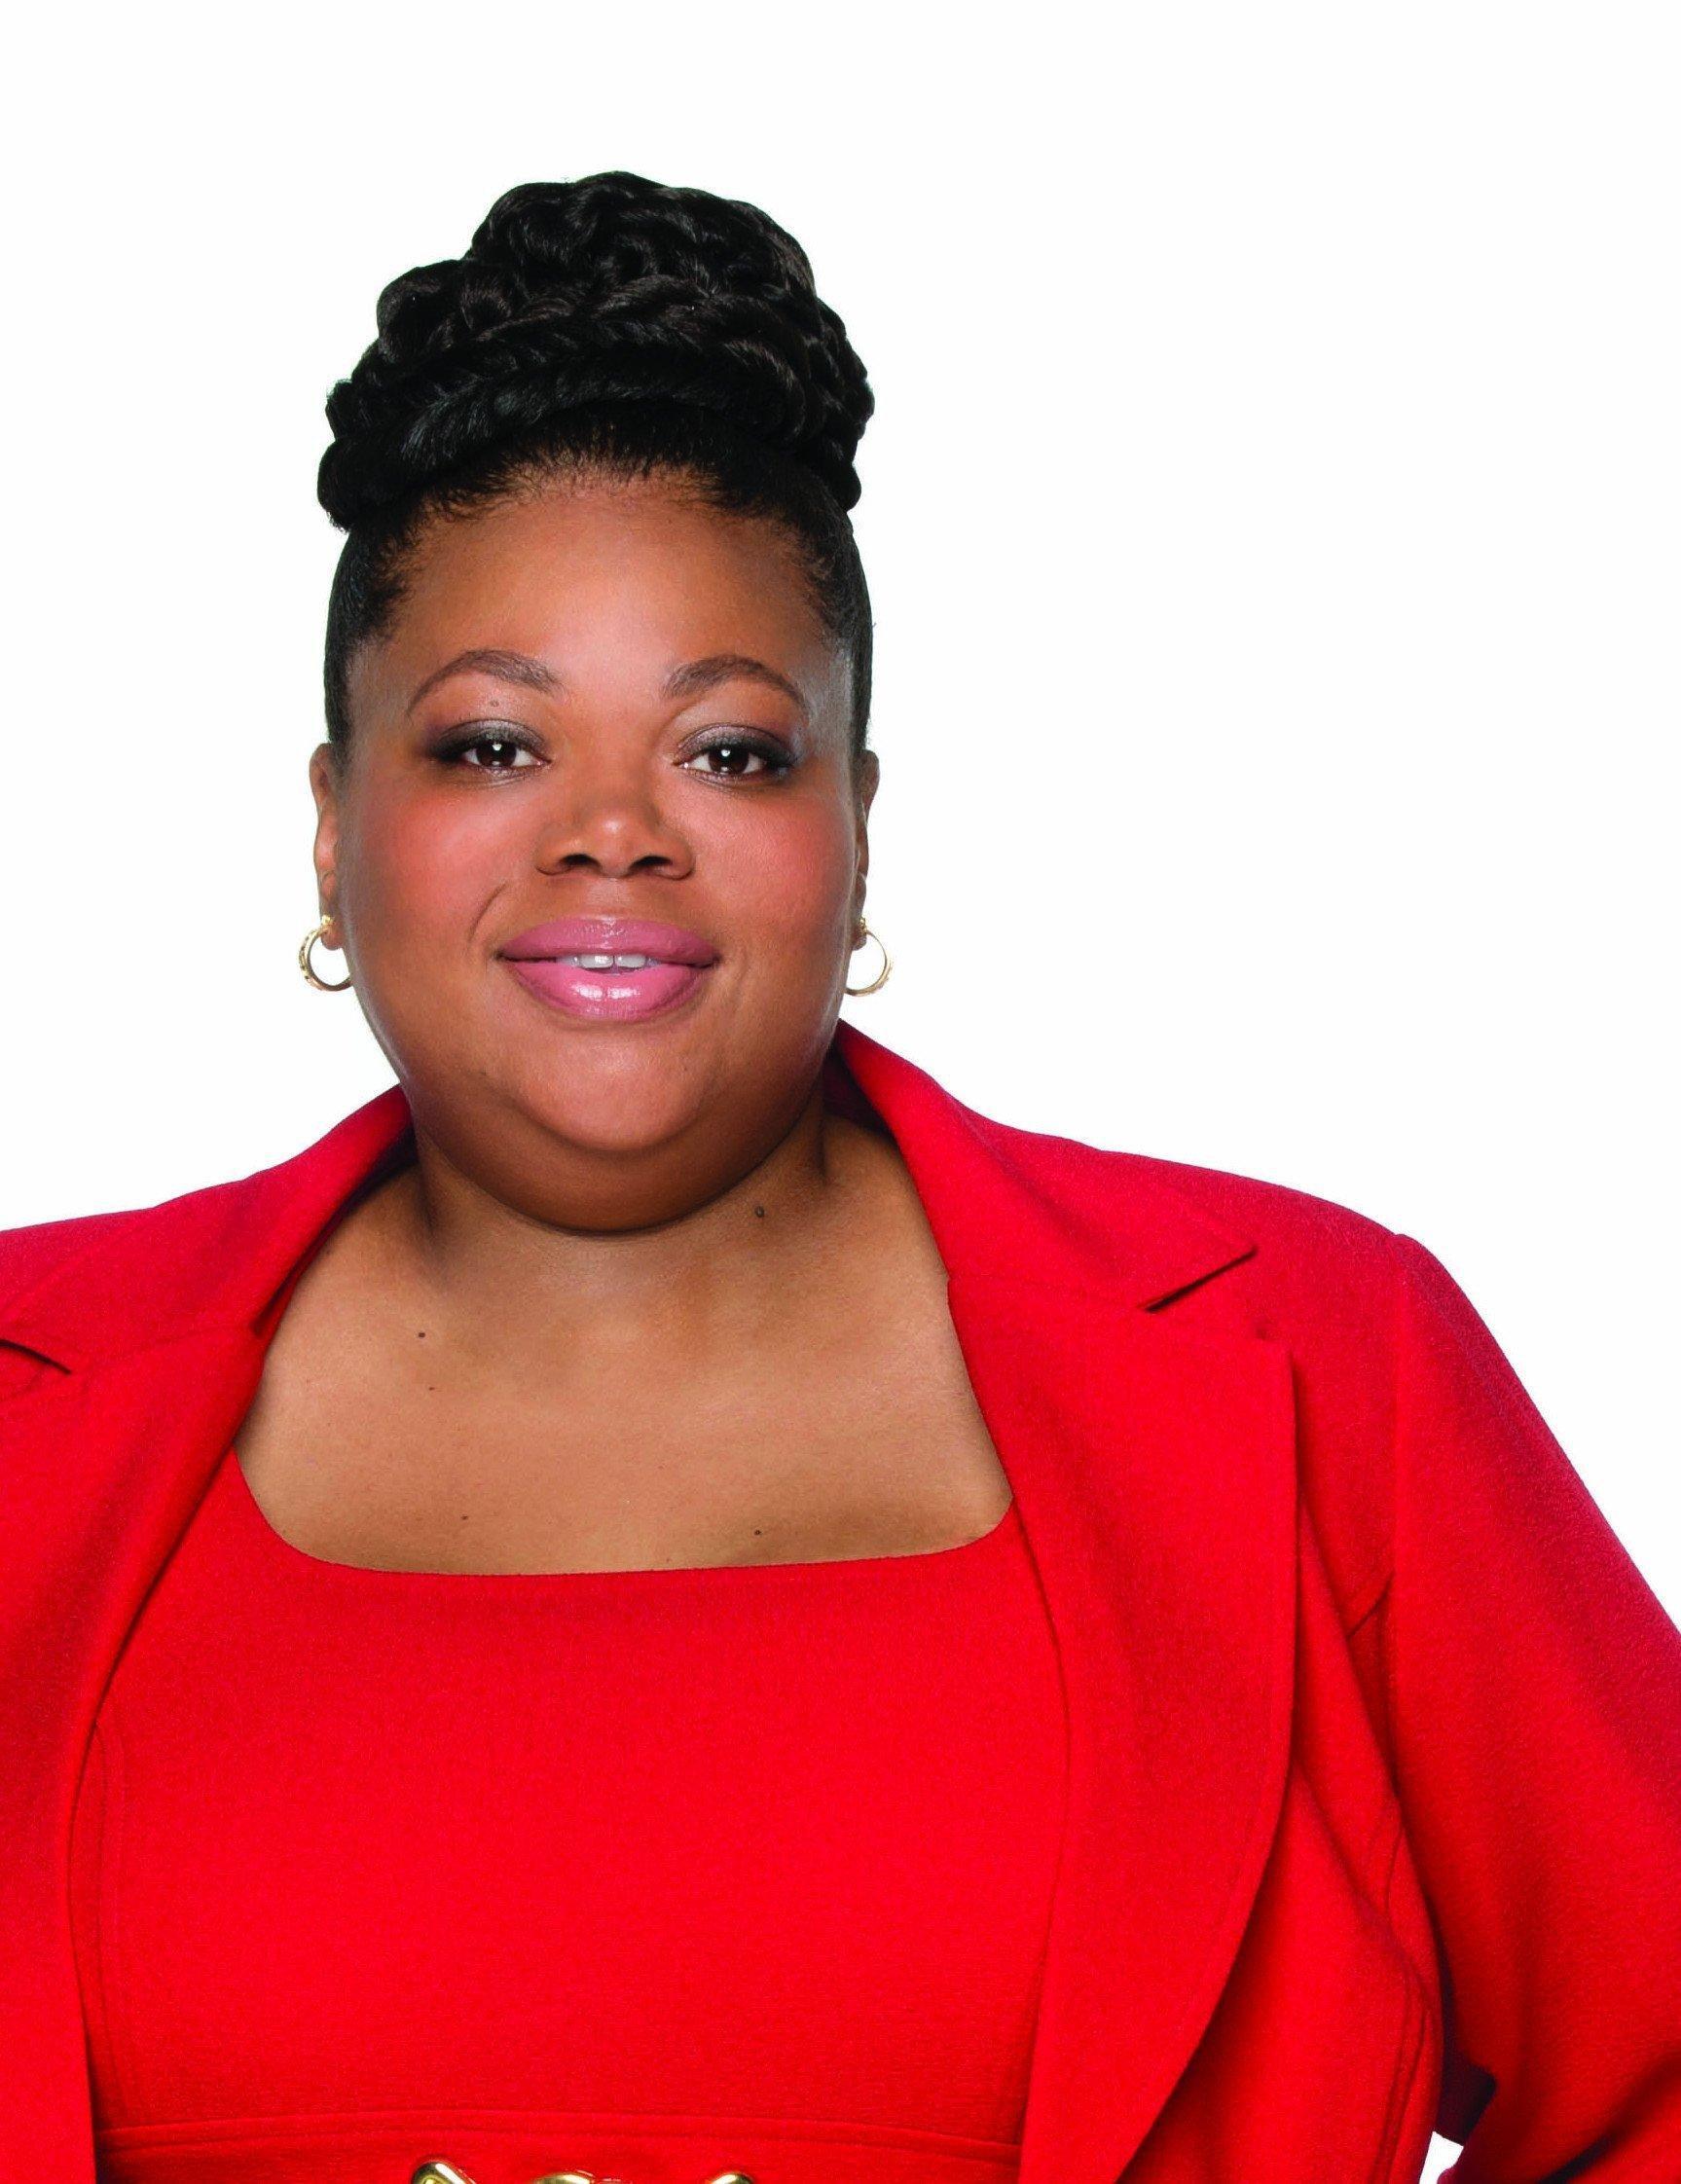 Rhonda Hall's Story - Diabetes Survivor - Women's Lifestyle Magazine Of Greater Kalamazoo